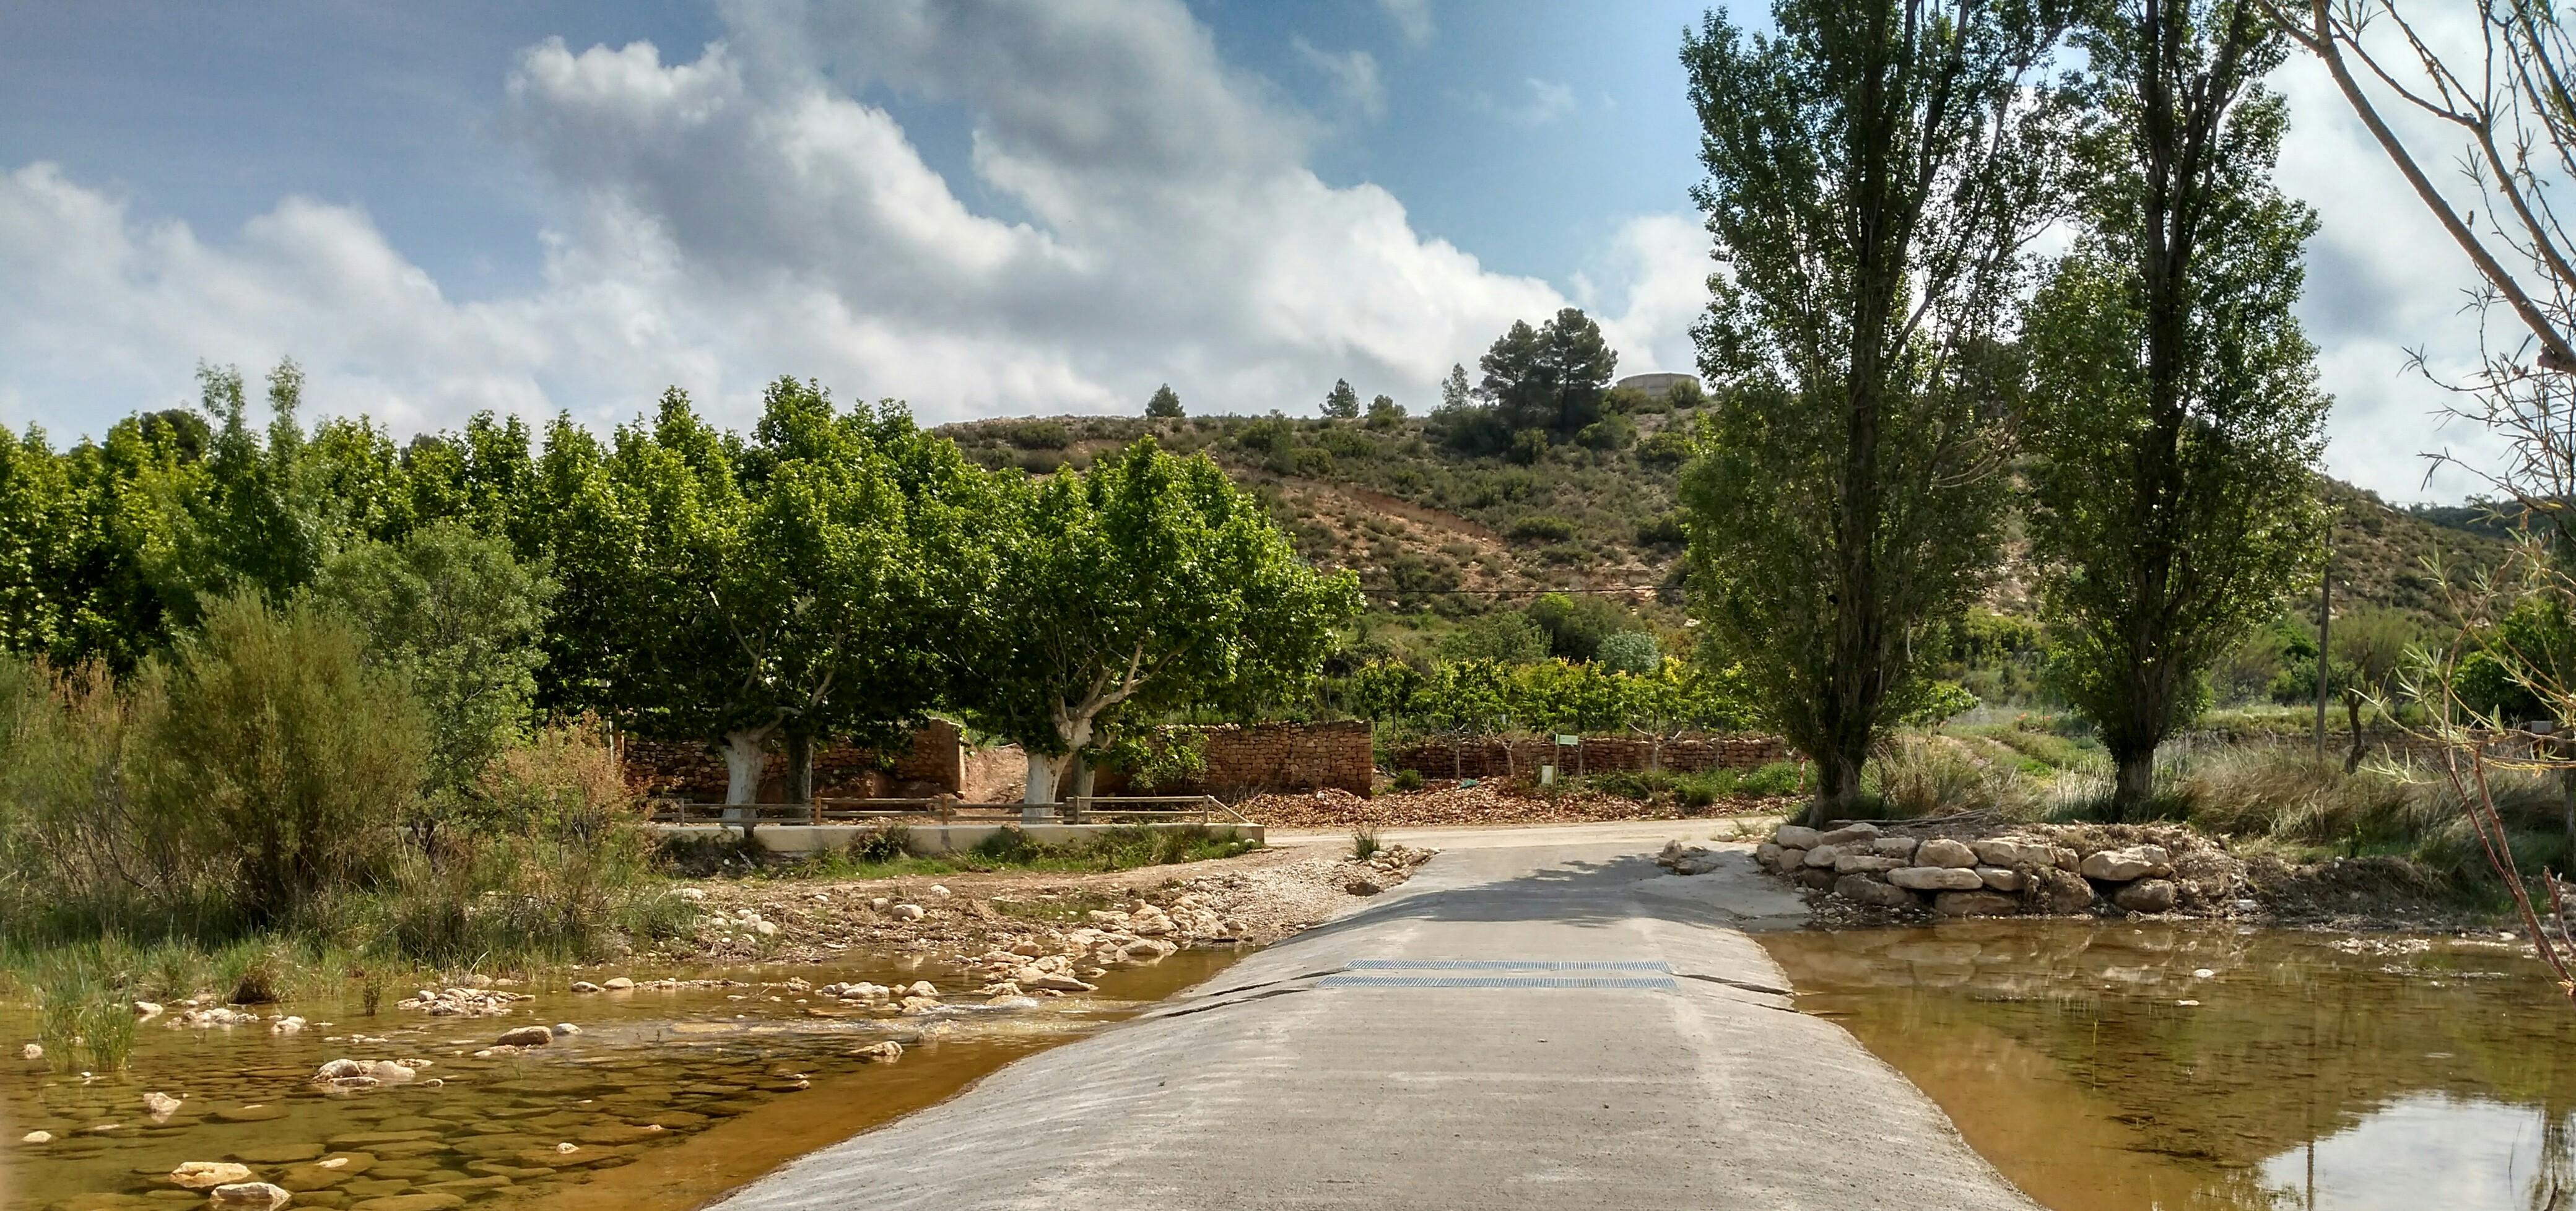 Pas del riu Algars a Caseres